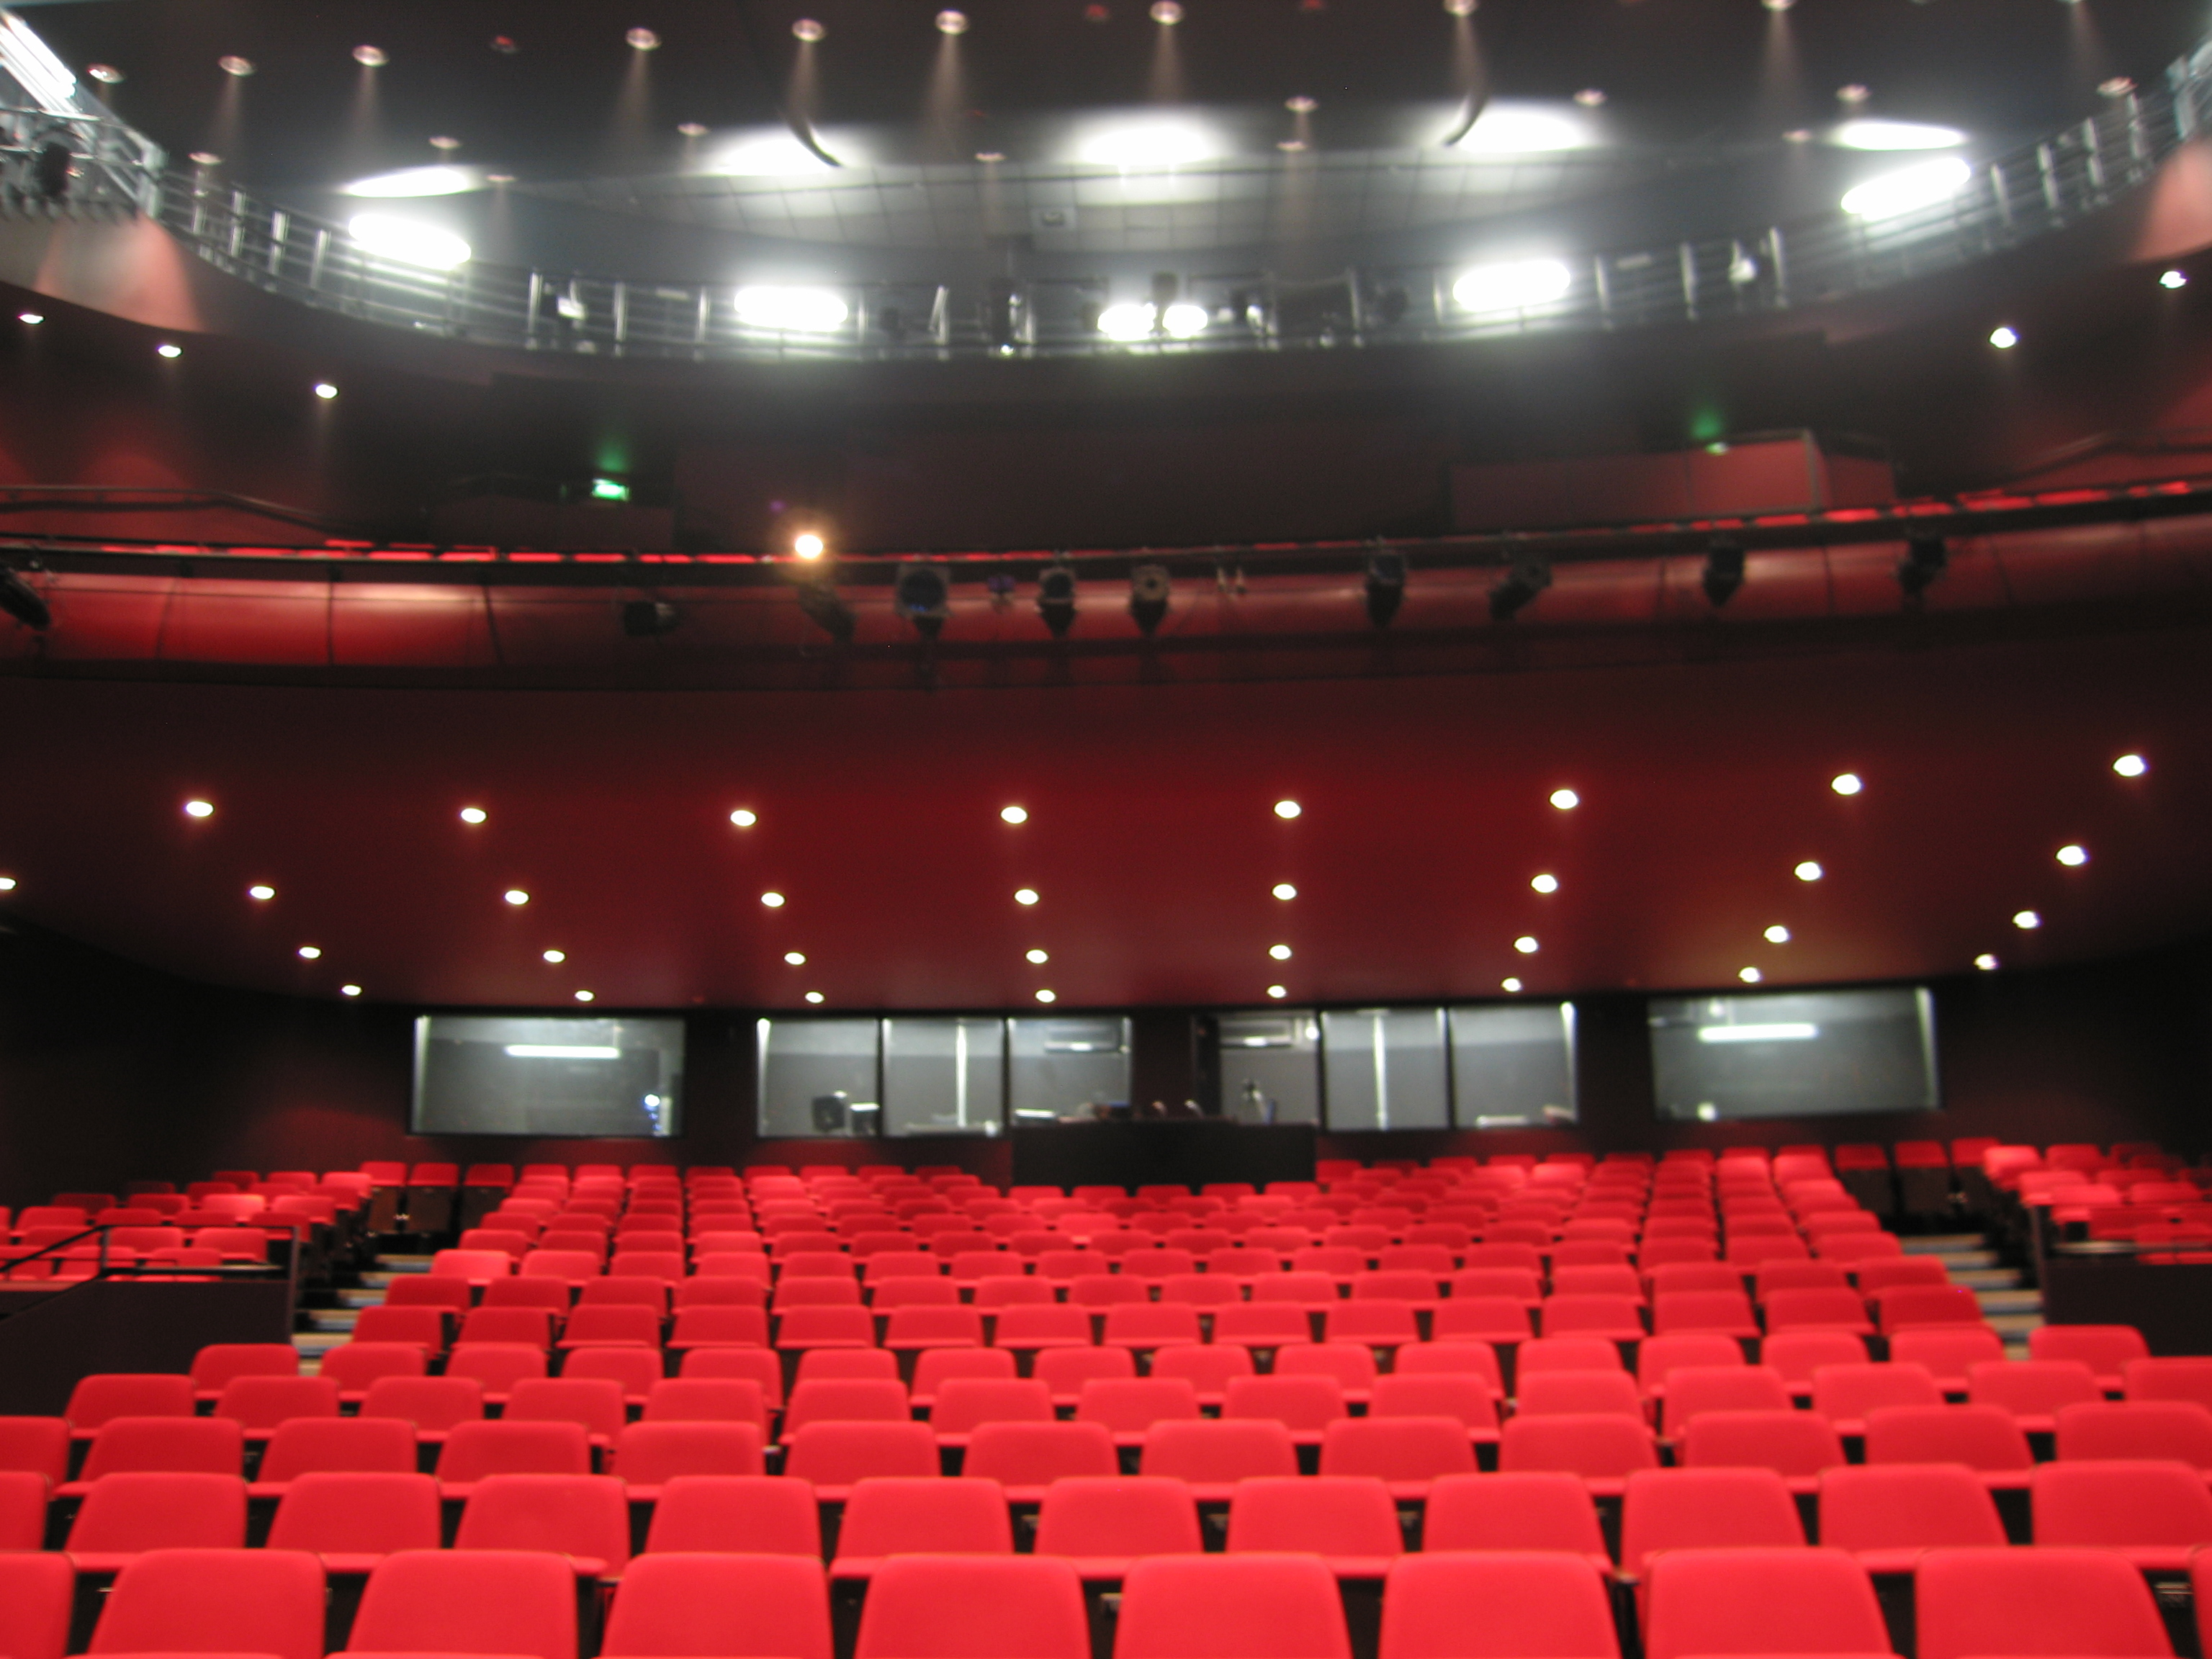 Leicester Performing Arts Centre | A. Edmonds & Co. Ltd.